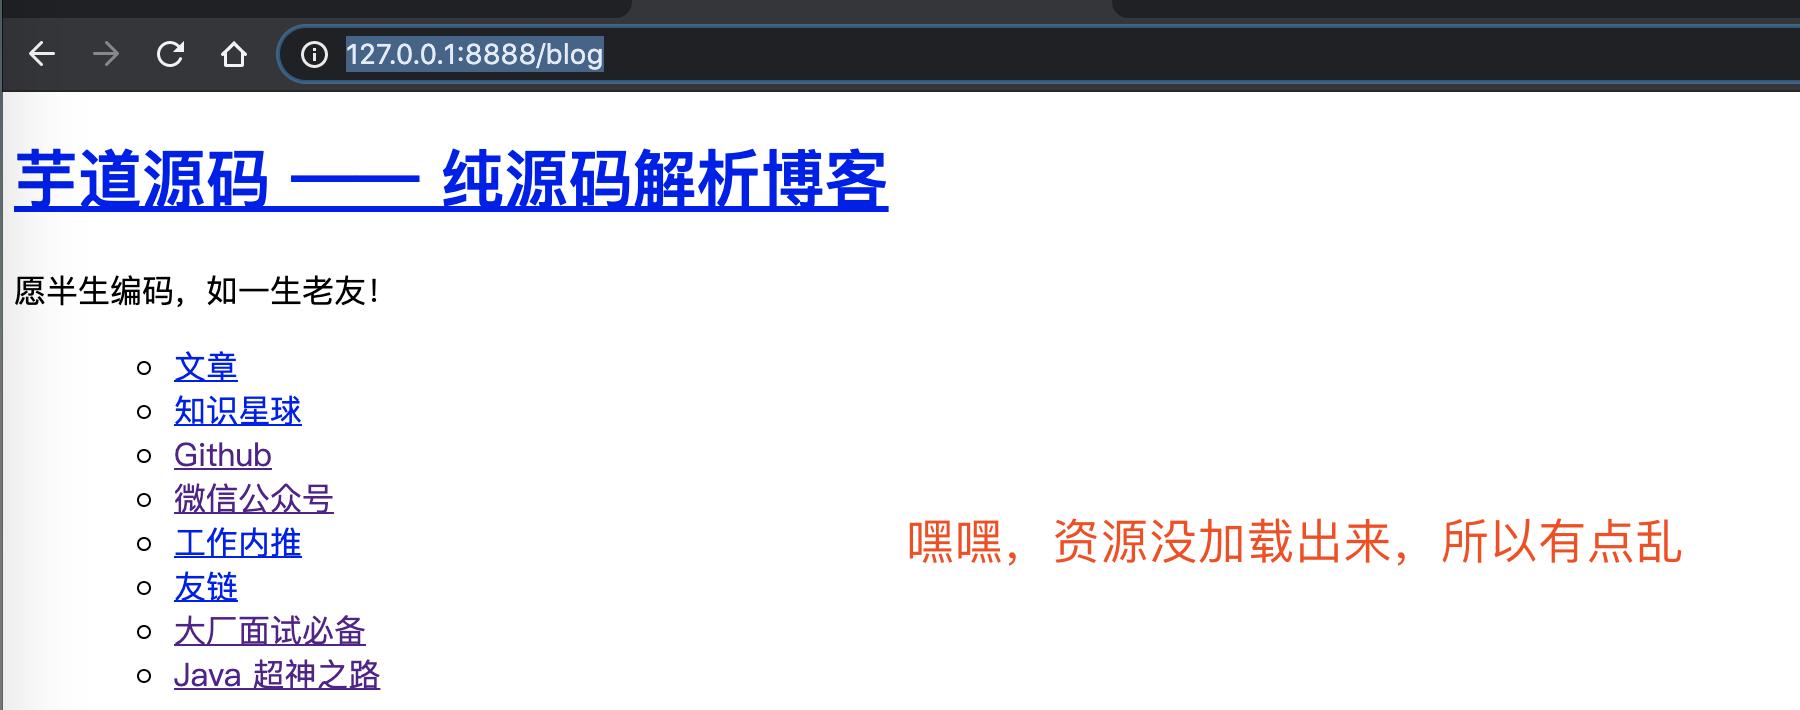 http://www.iocoder.cn